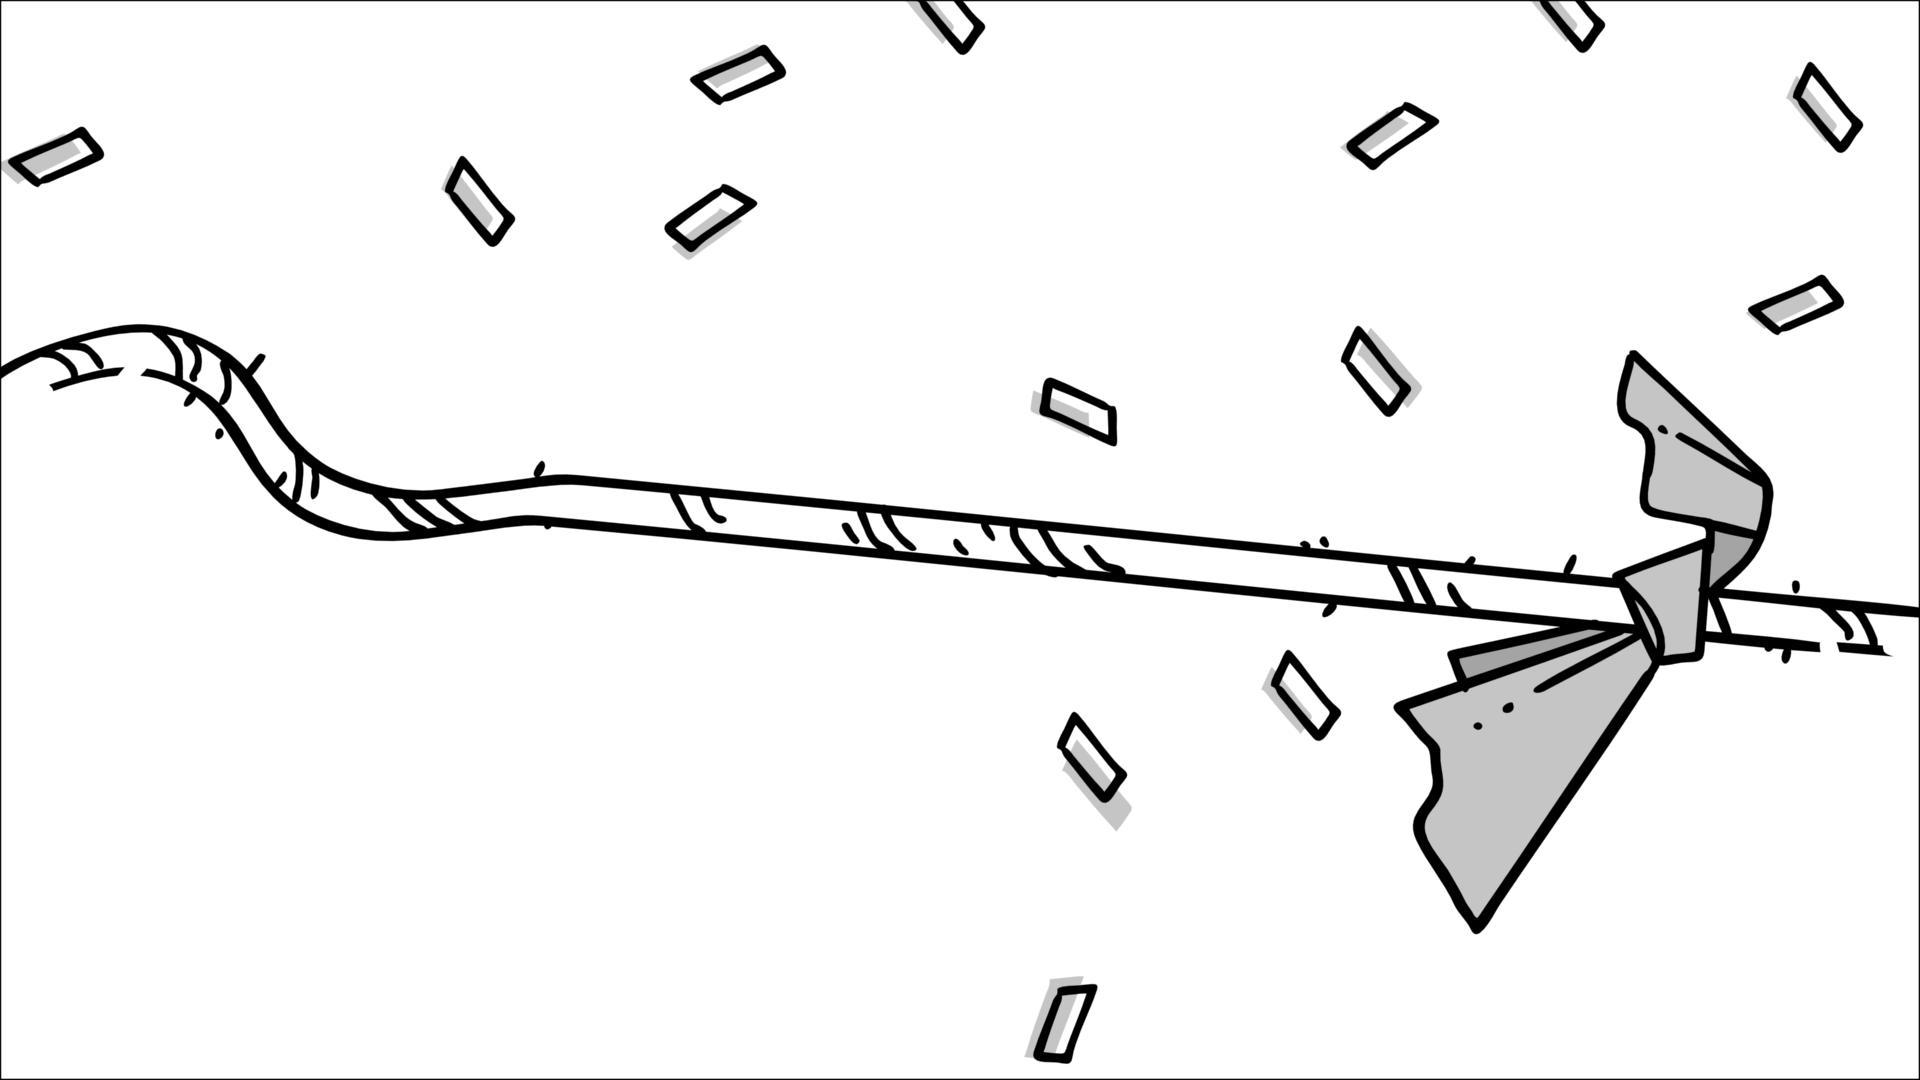 Cognizant_Storyboards_001-1-24.jpg